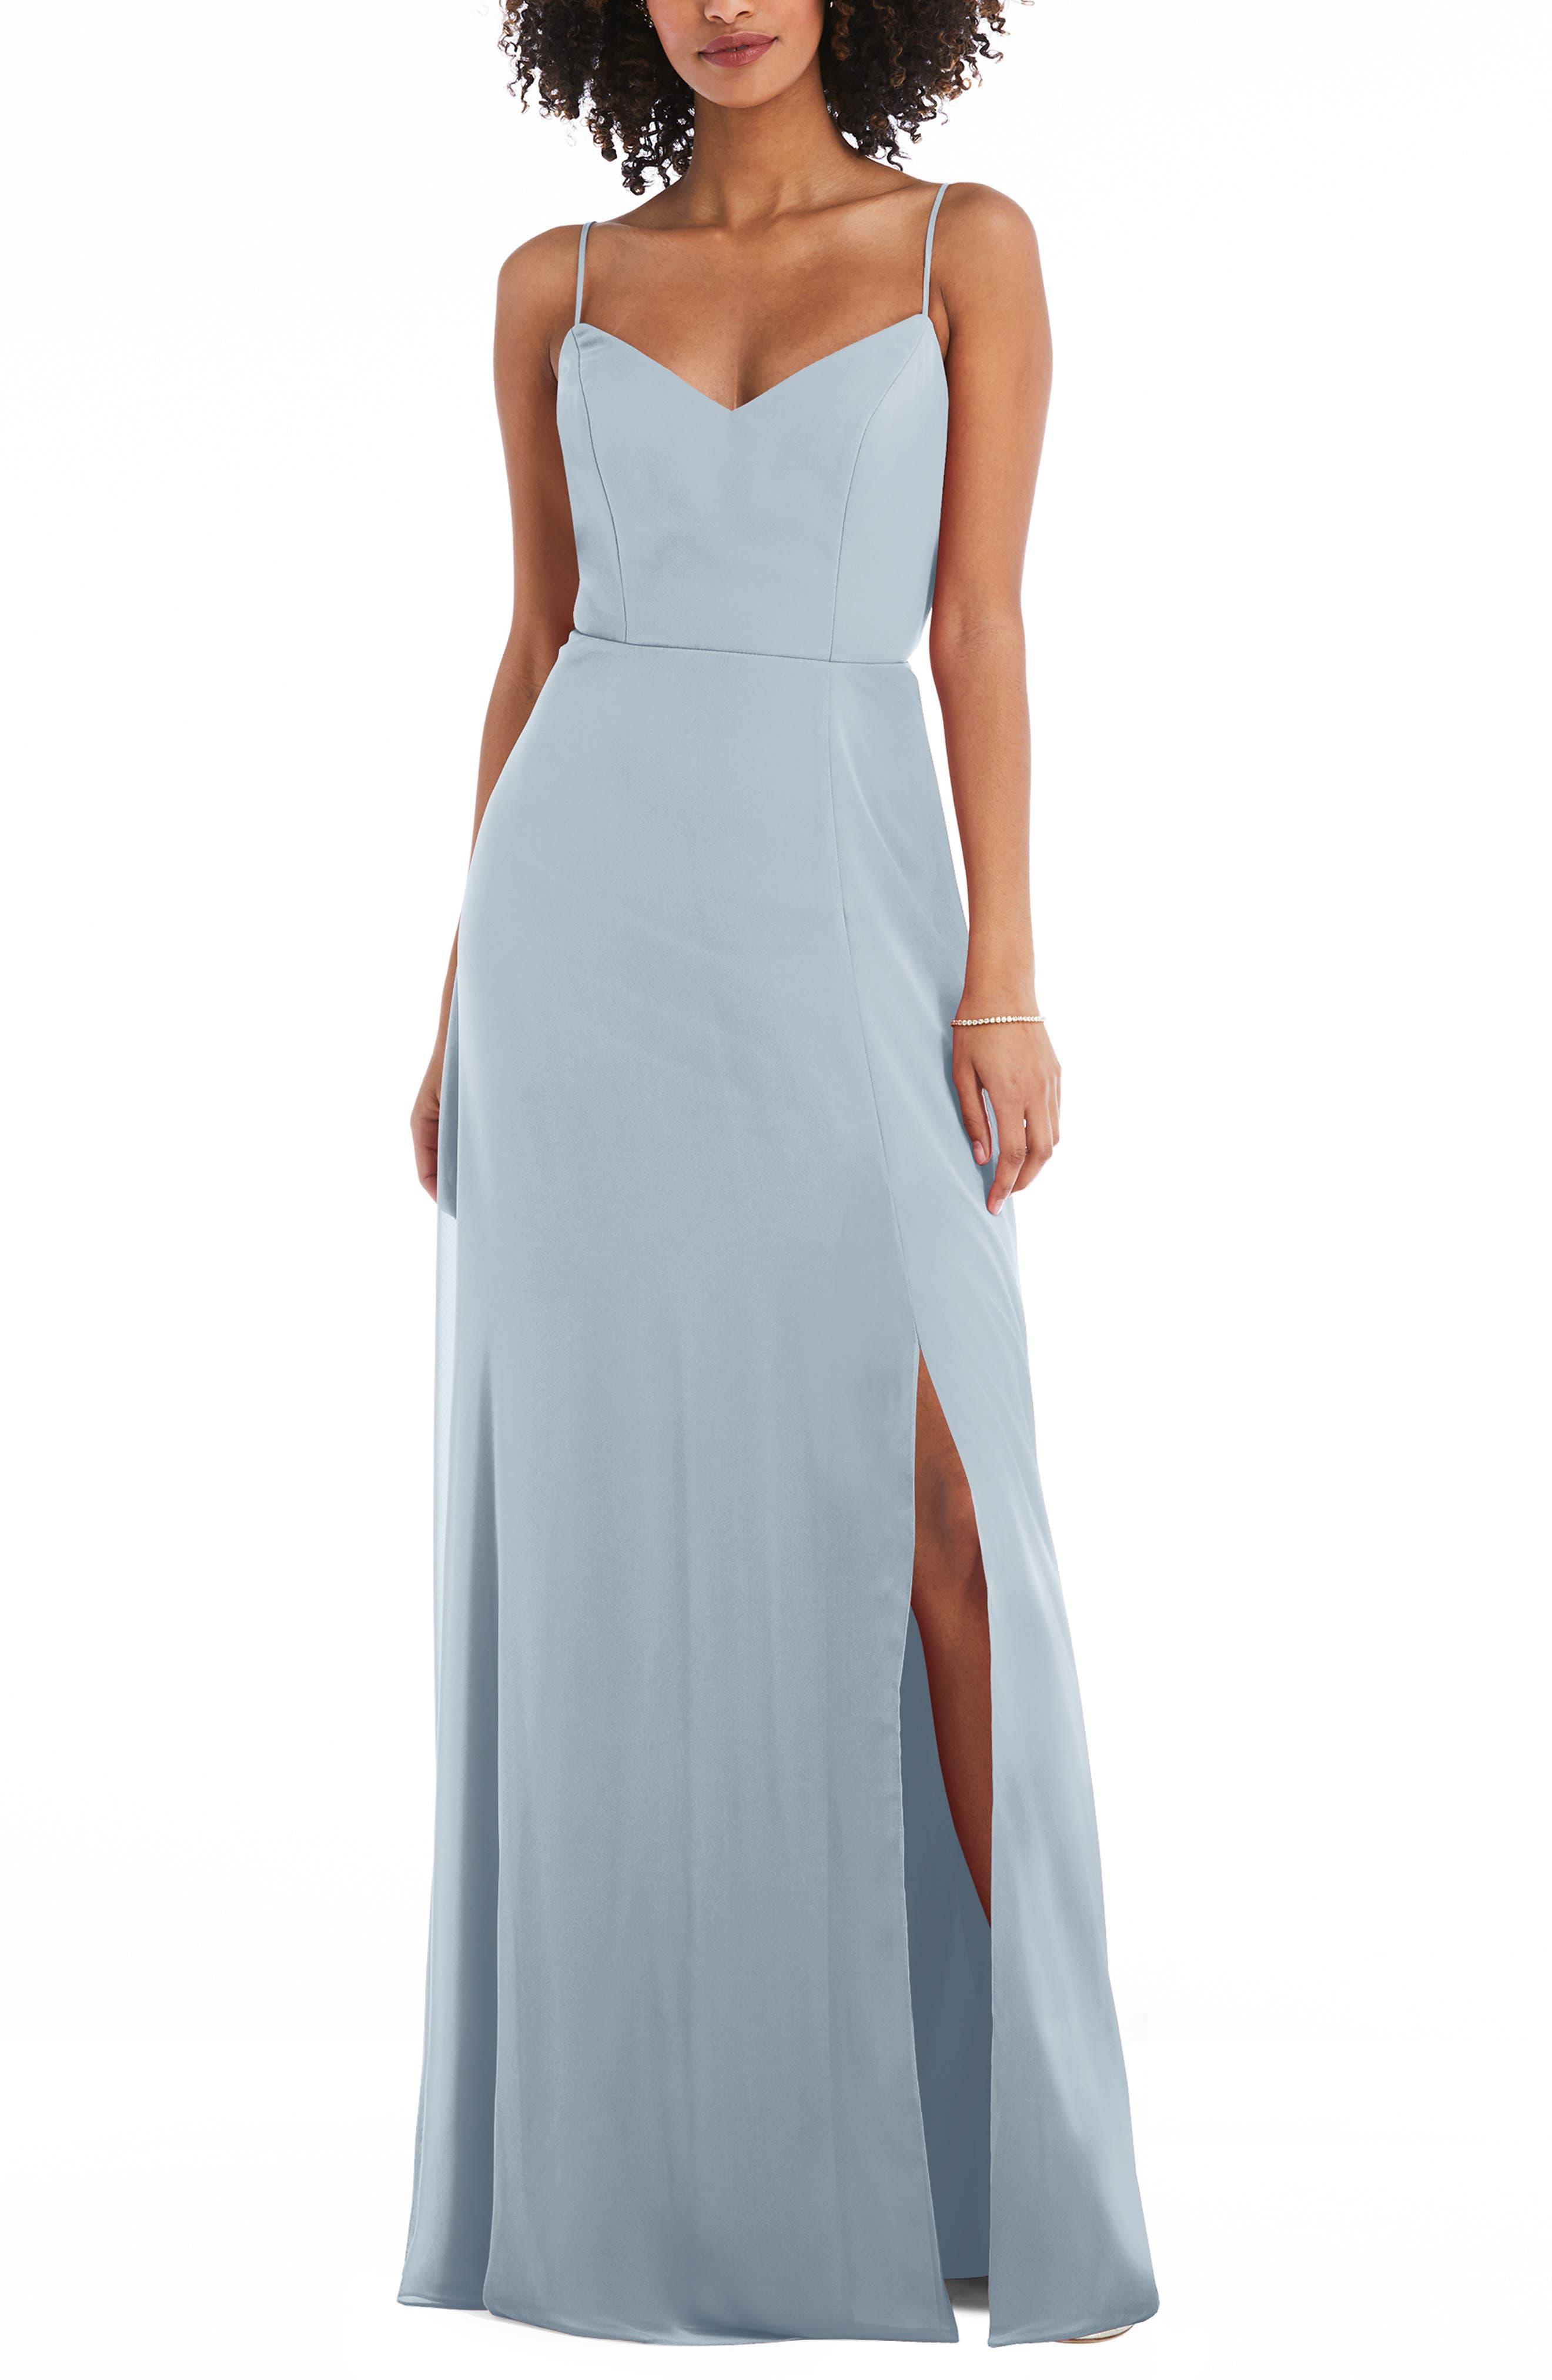 Tie Back Cutout Chiffon Gown